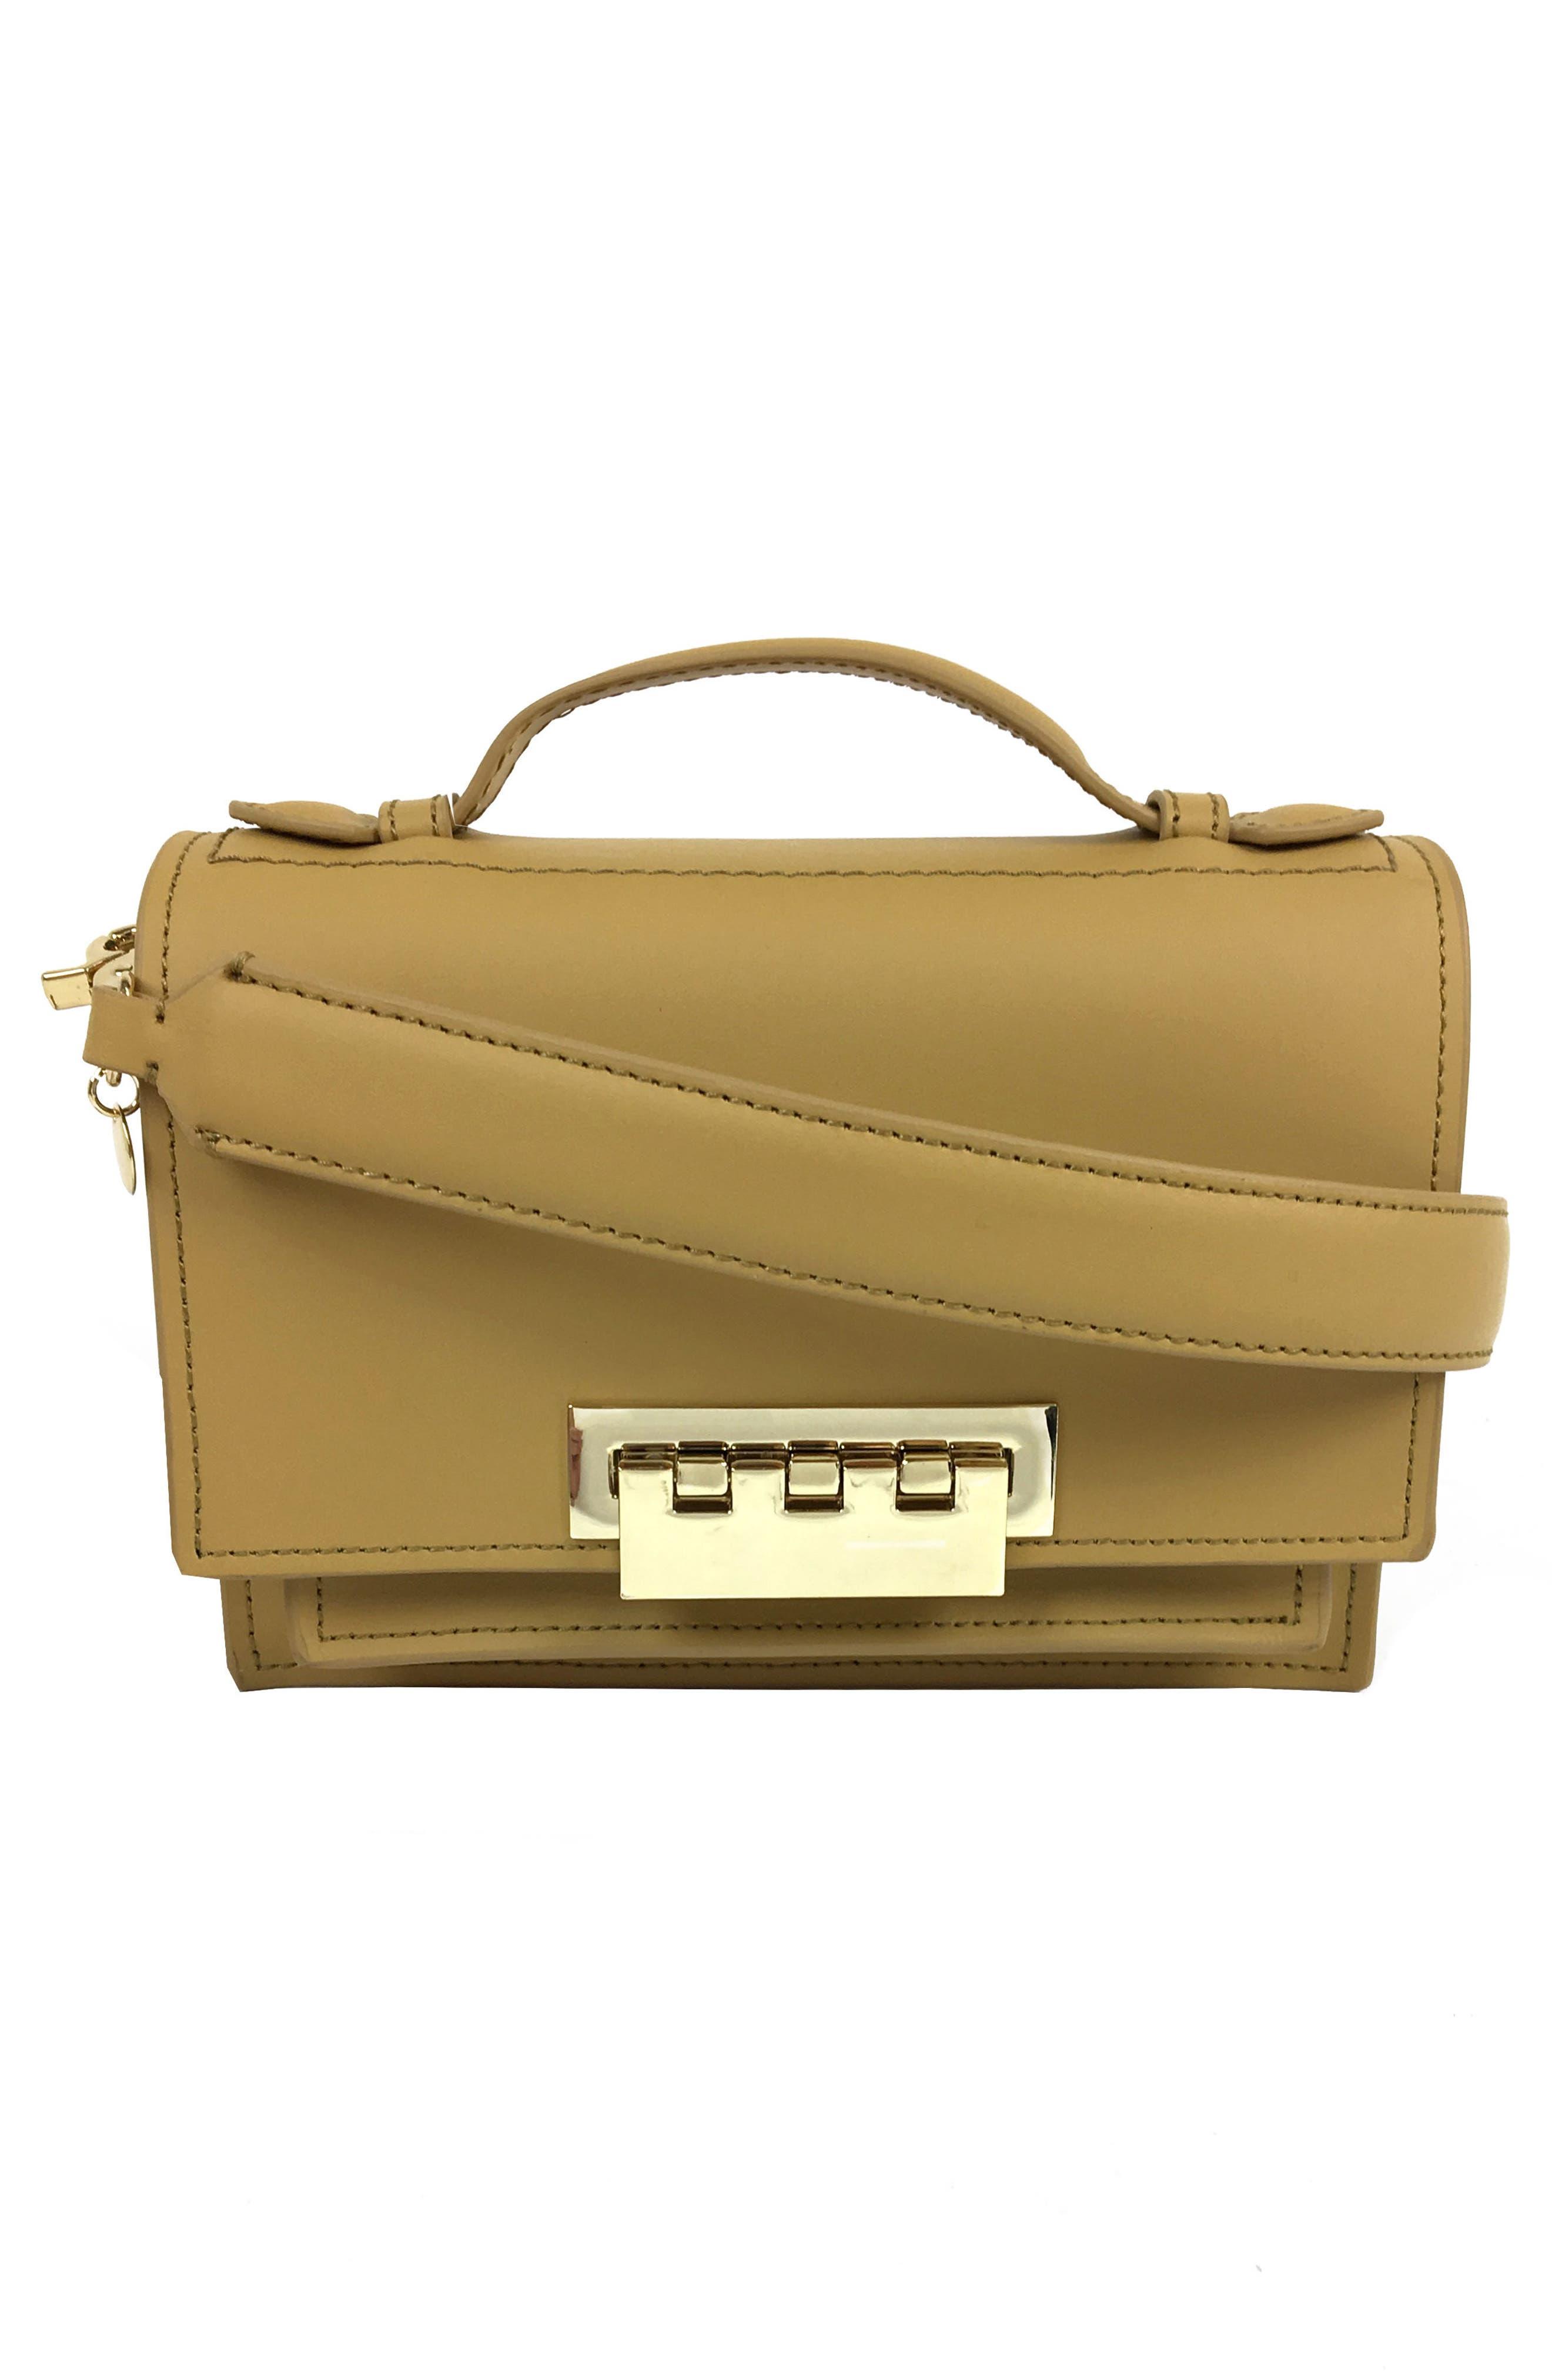 Alternate Image 1 Selected - ZAC Zac Posen Earthette Leather Accordion Bag